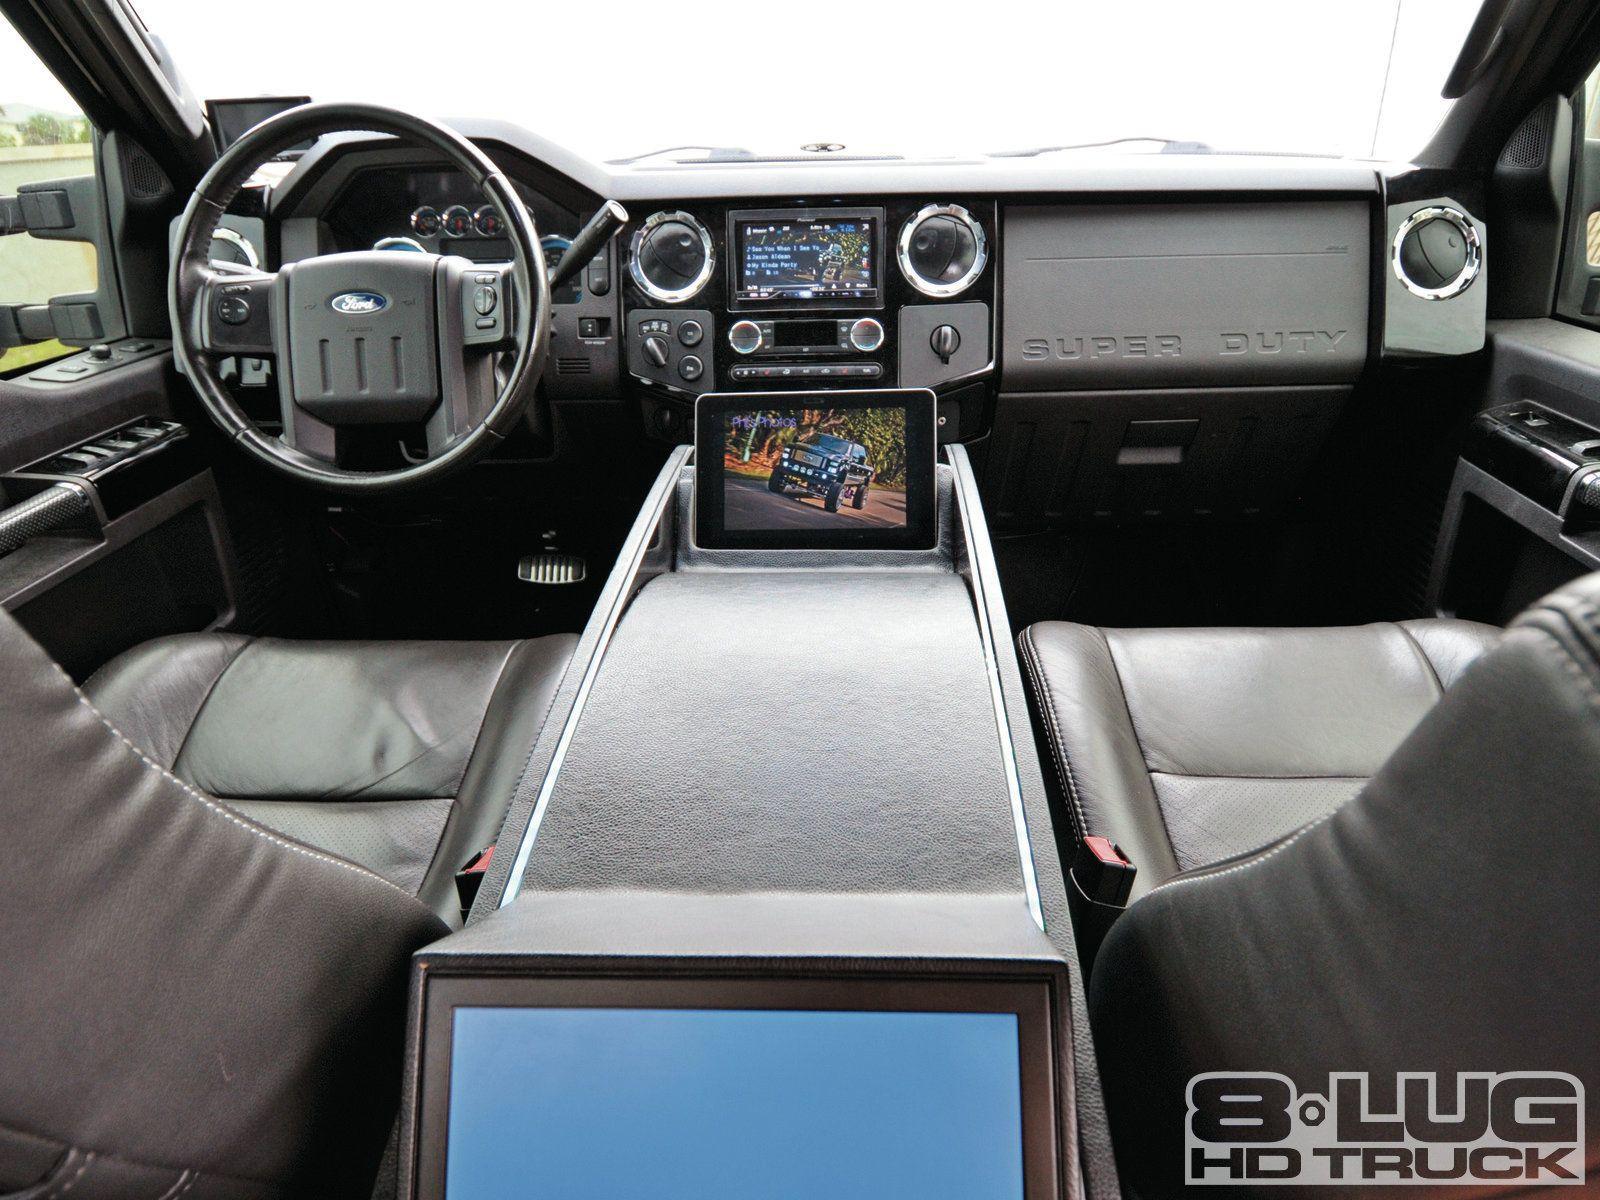 small resolution of 1301 8l 09 sema was the goal custom center console